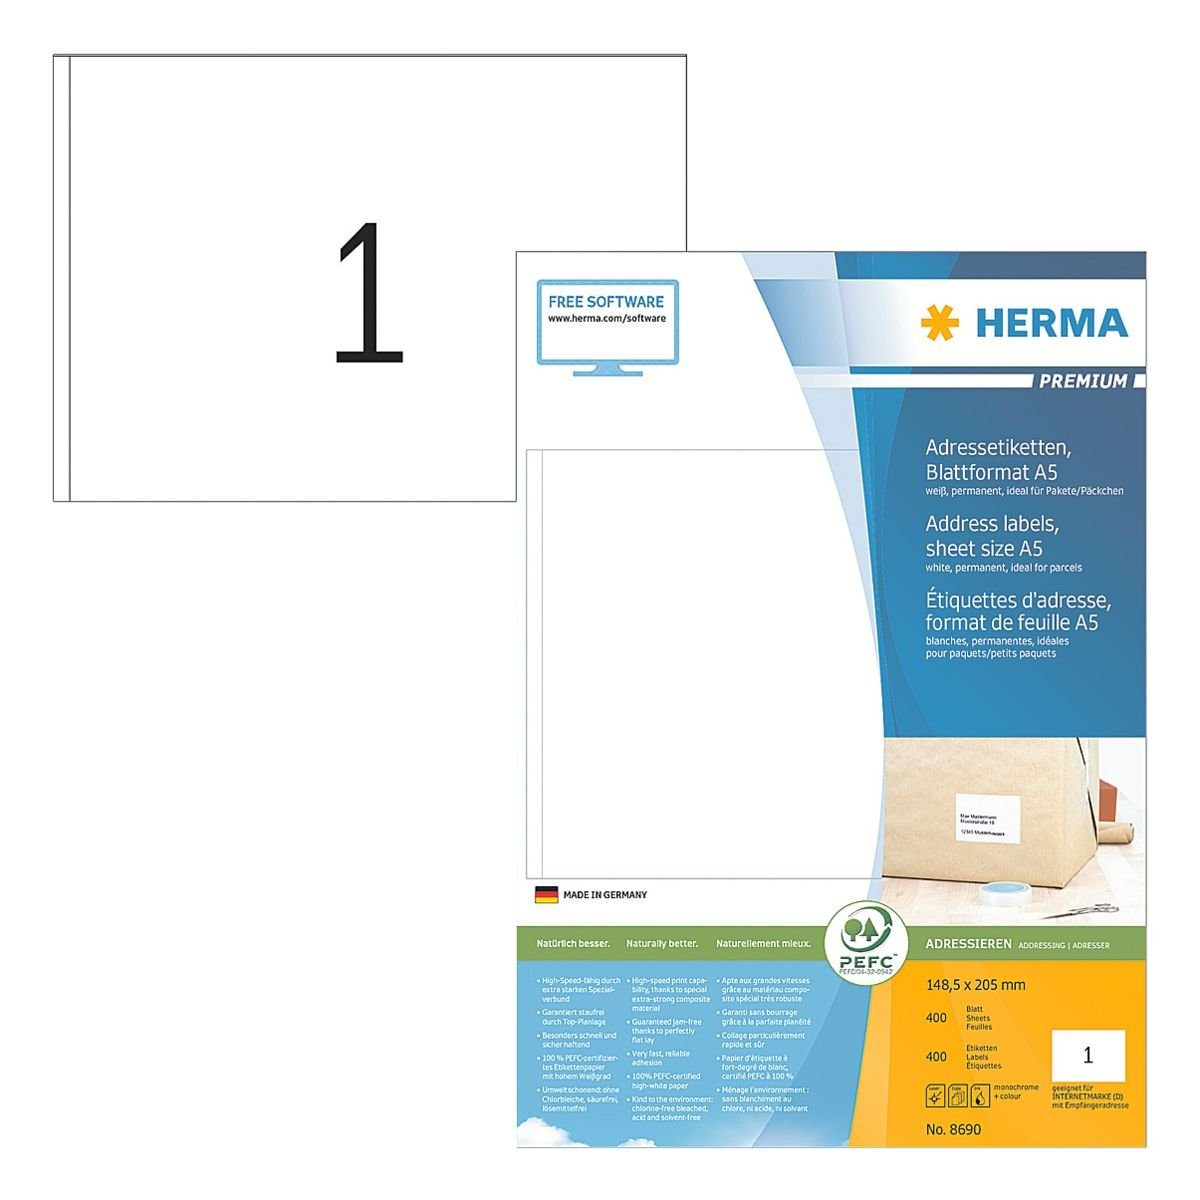 HERMA 400er-Set Universal-Klebeetiketten »8690«